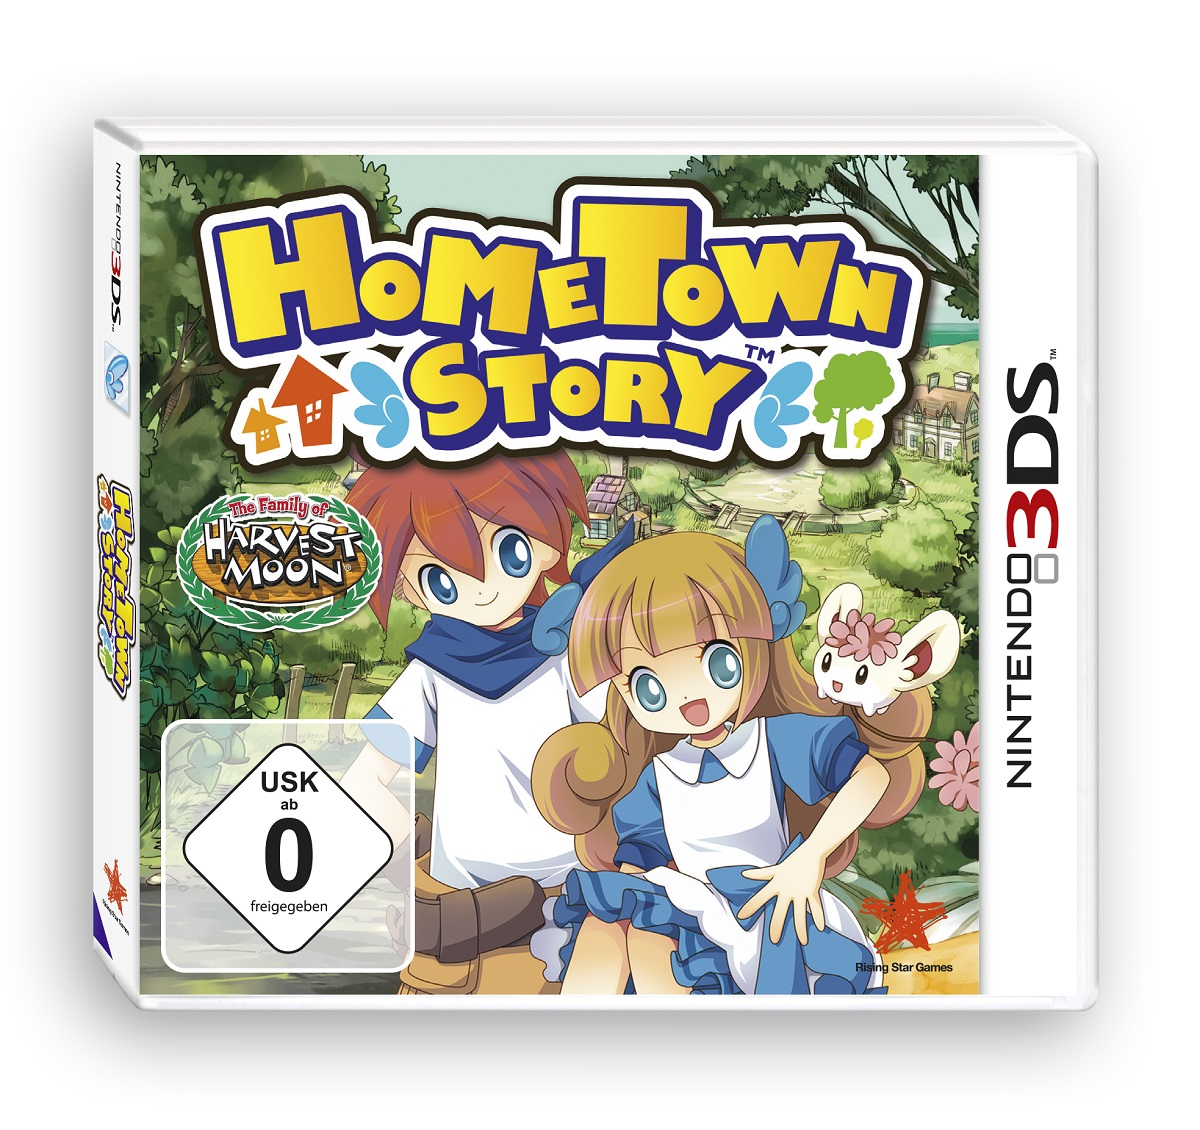 Hometown_Story_Packshot